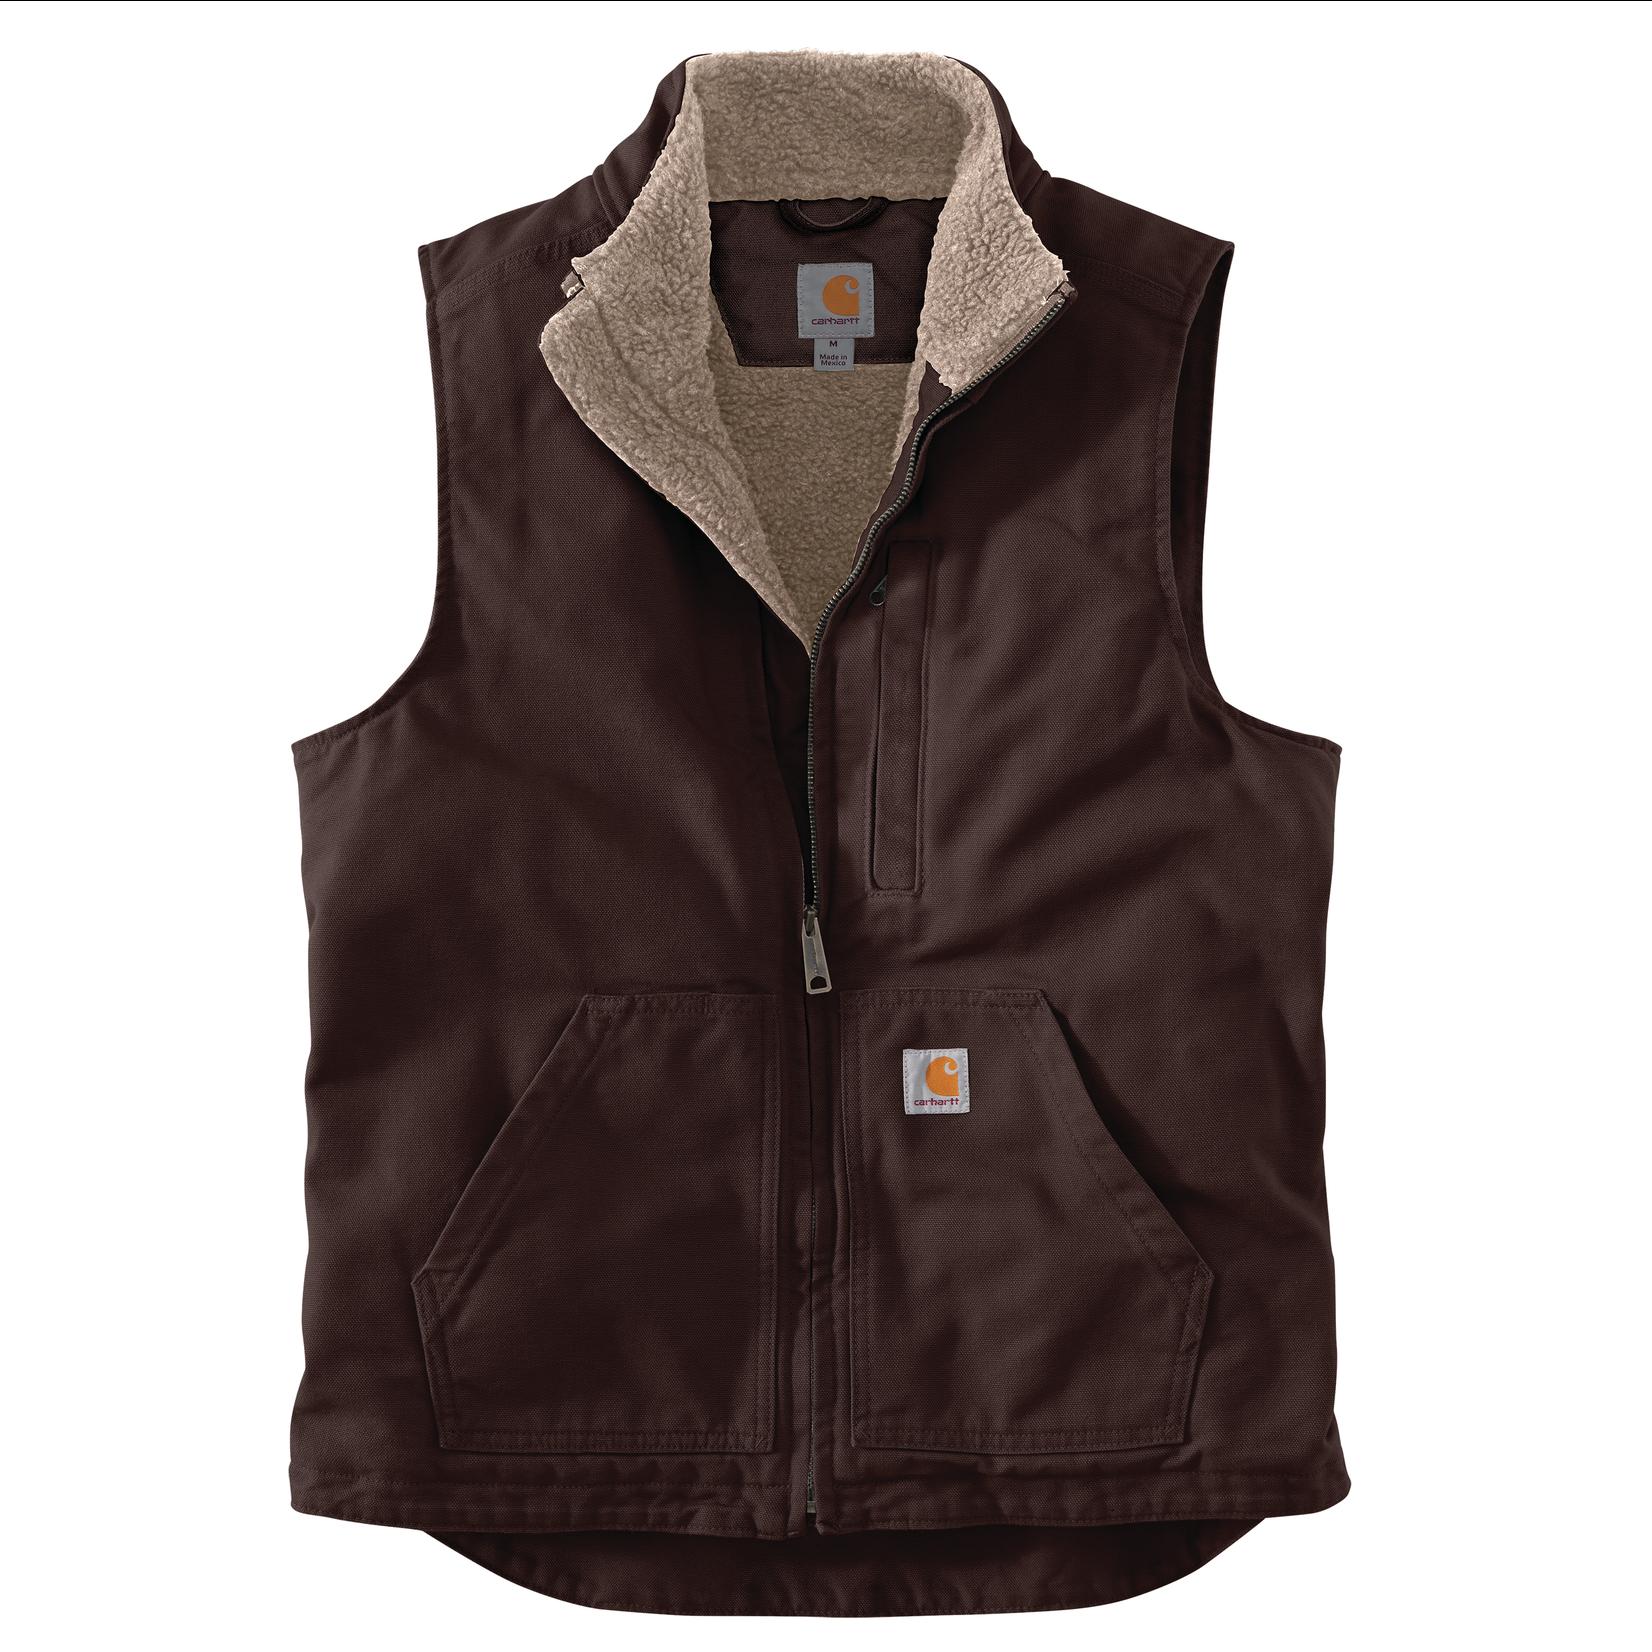 Carhartt Carhartt 104277 Loose Fit Washed Duck Sherpa Lined Mock-Neck Vest - DKB Dark Brown